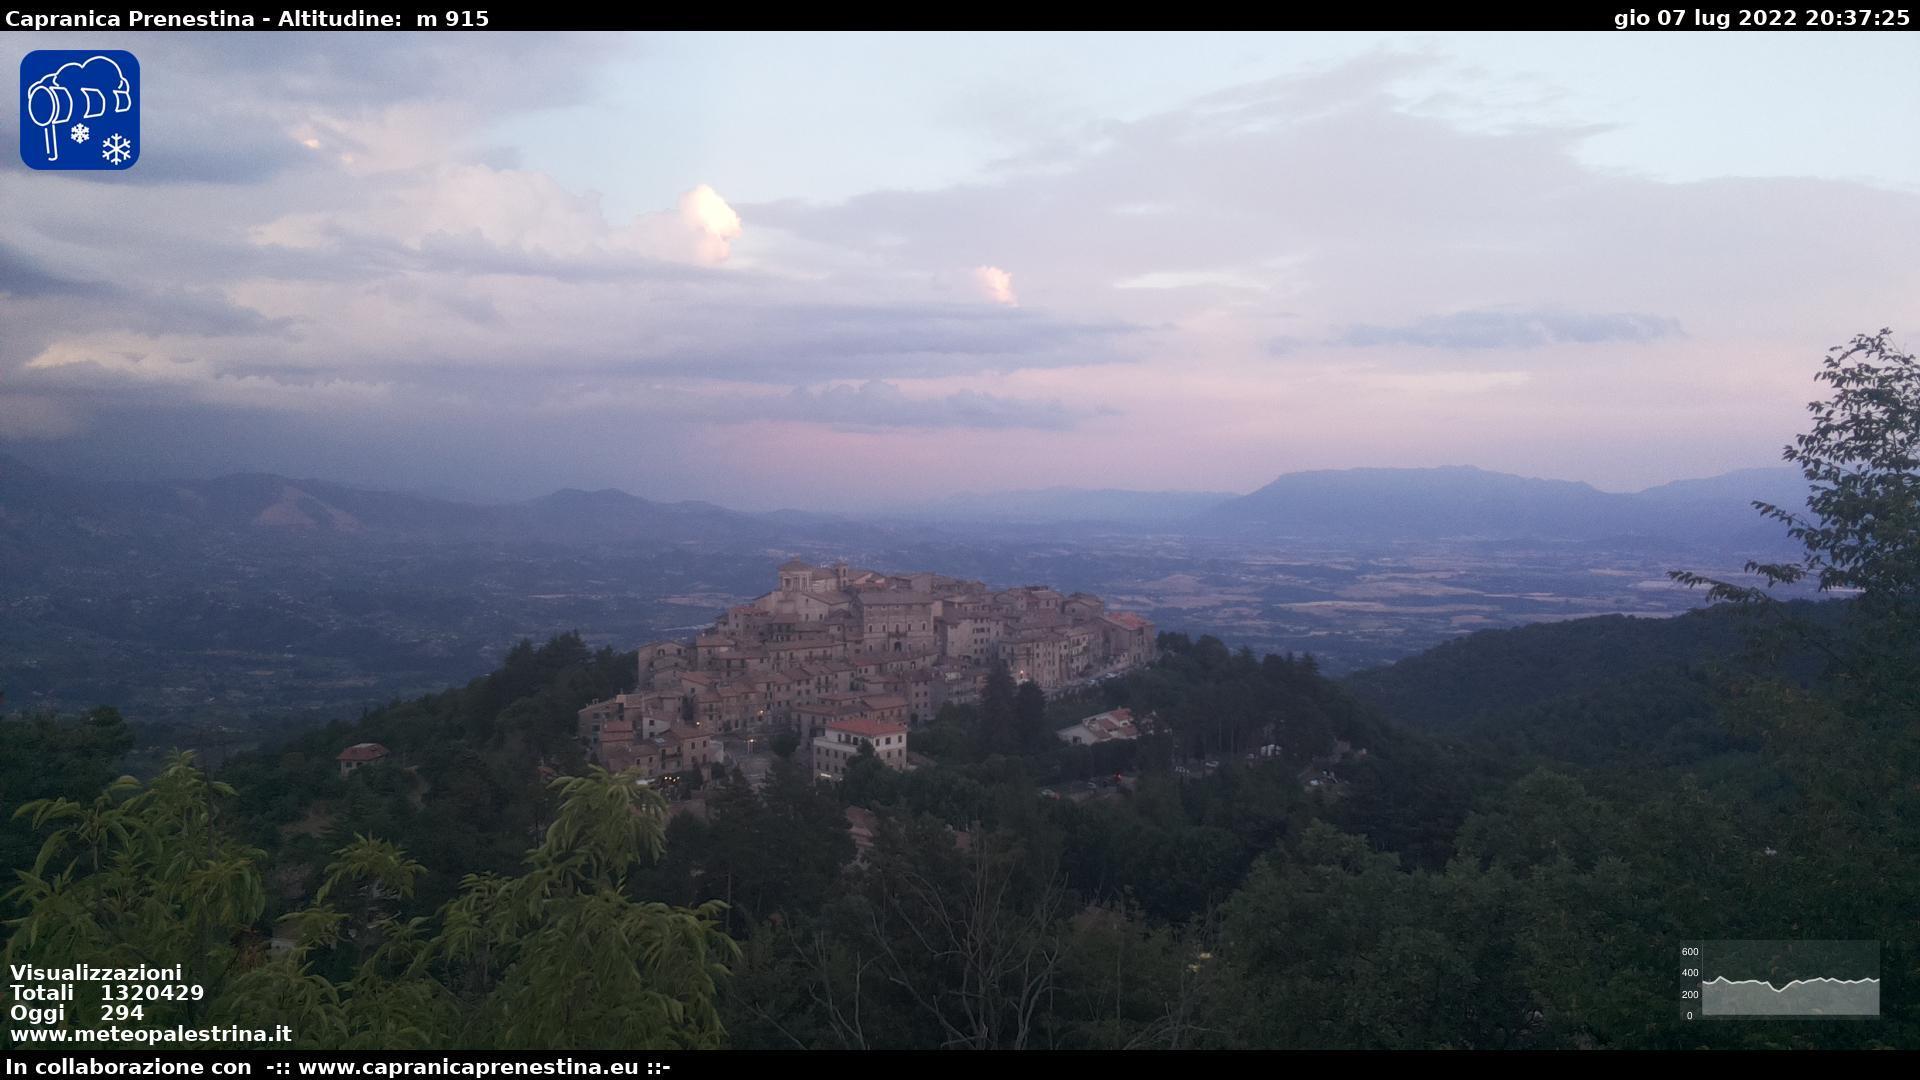 Webcam Capranica Prenestina